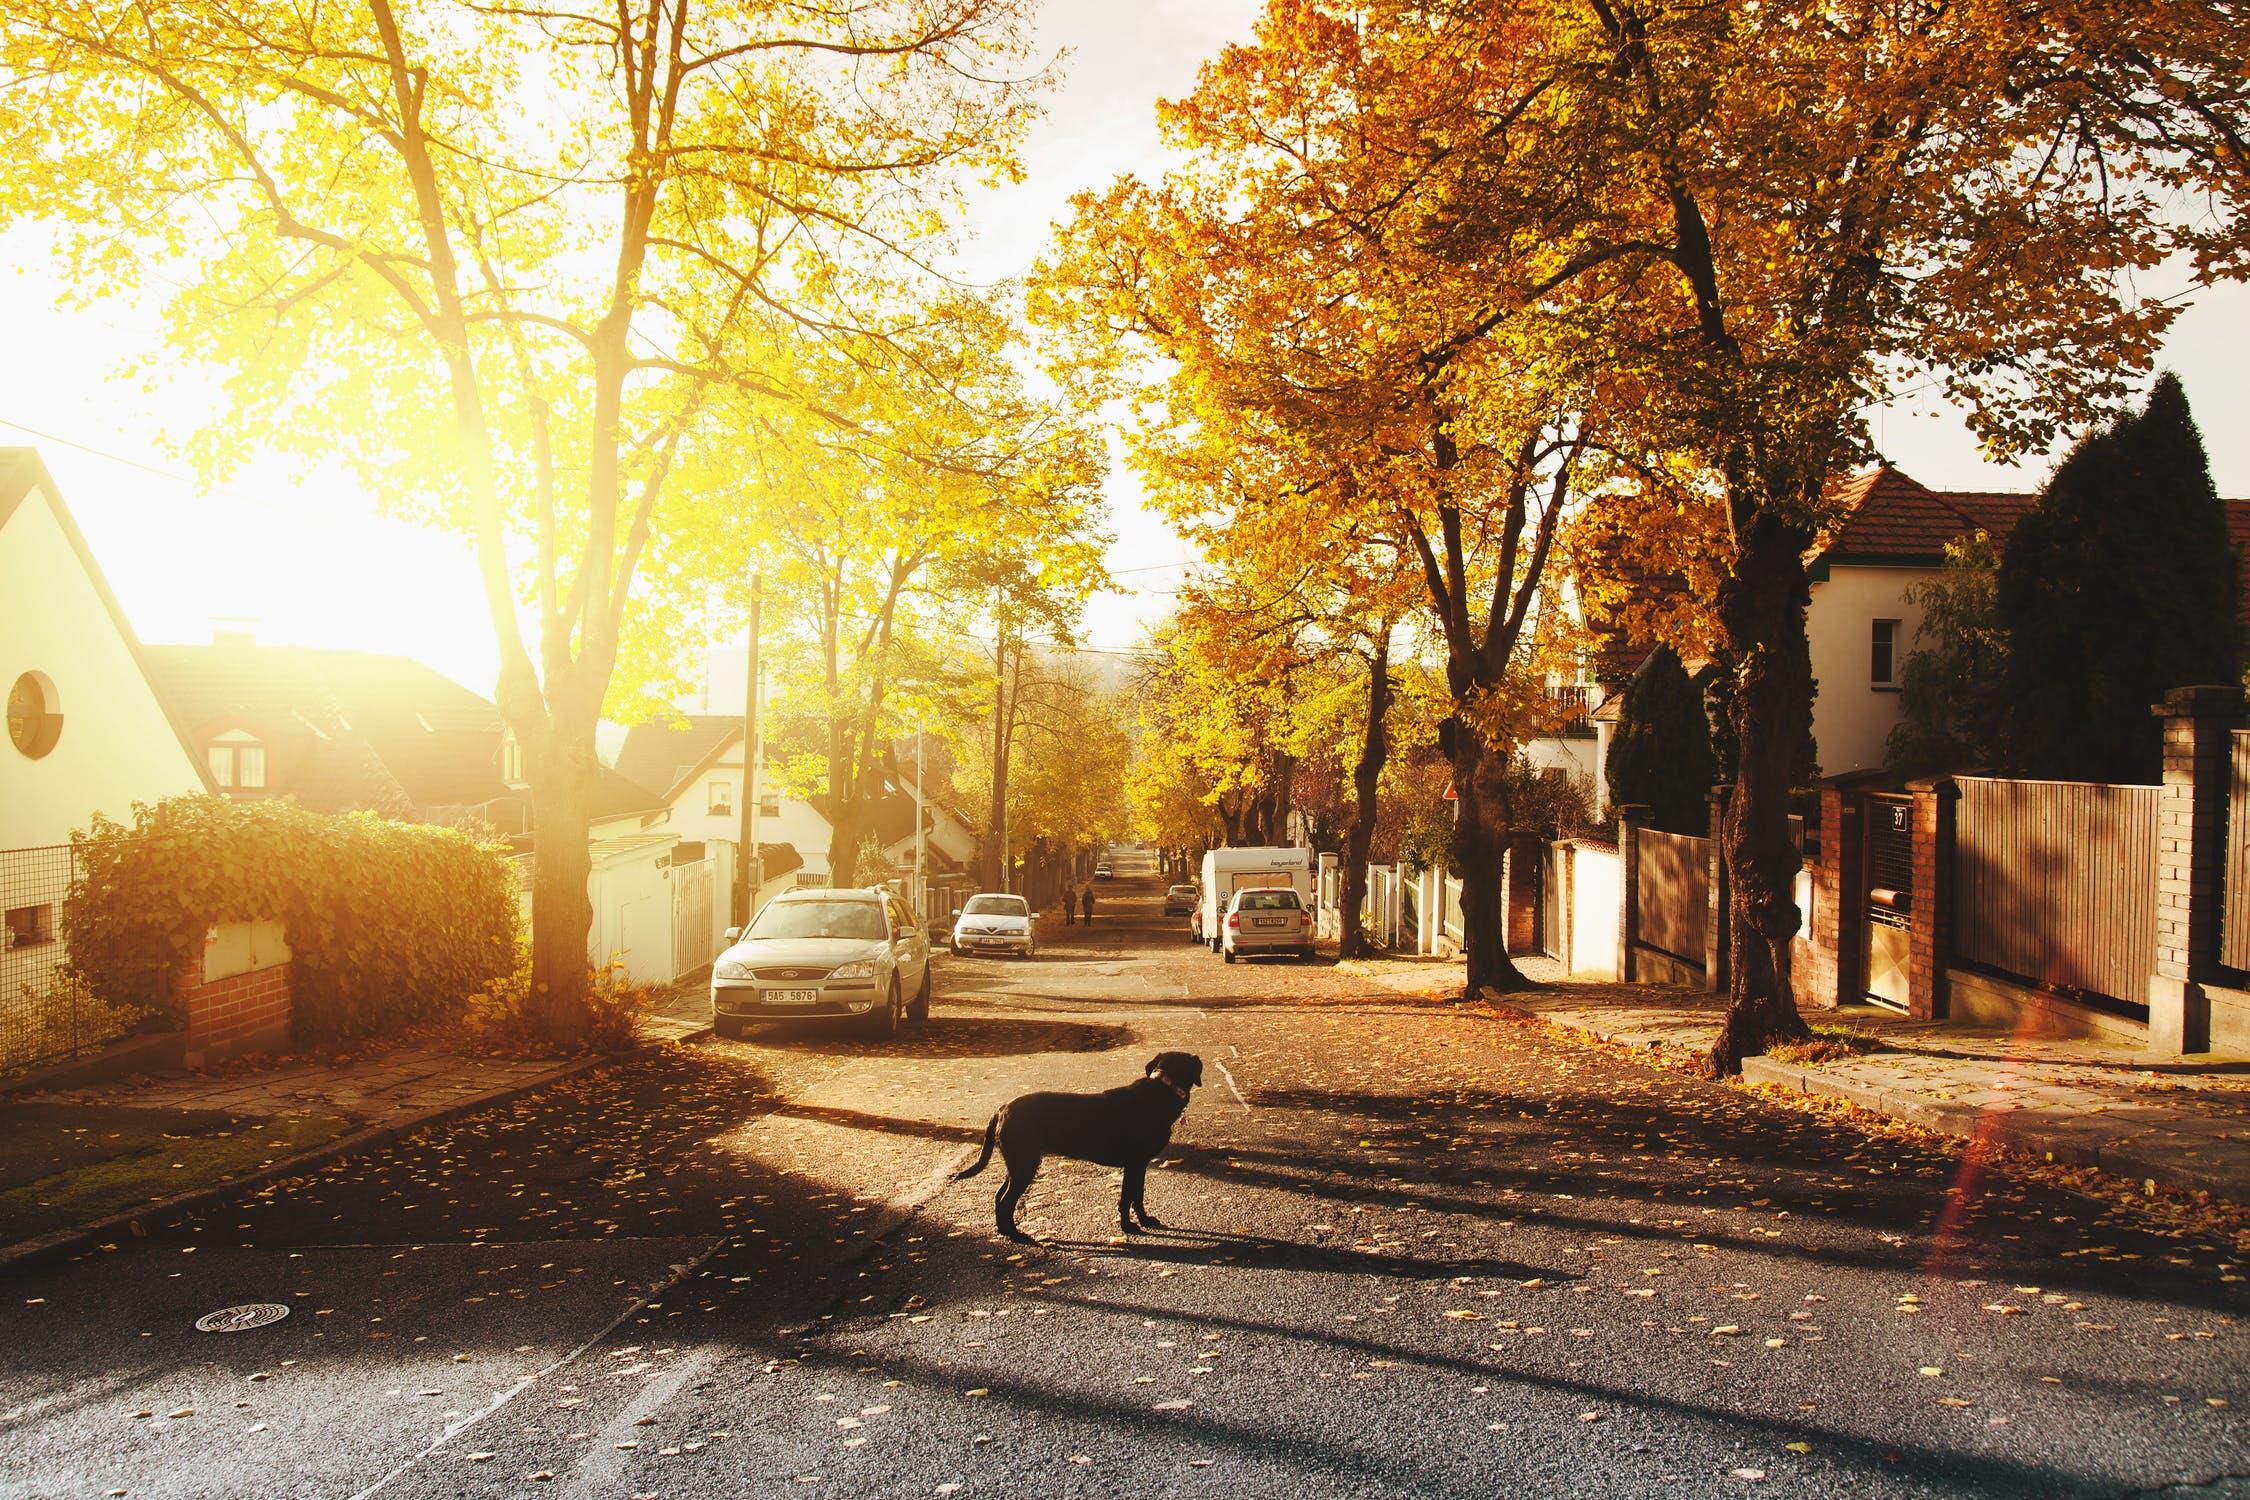 Help a roaming dog